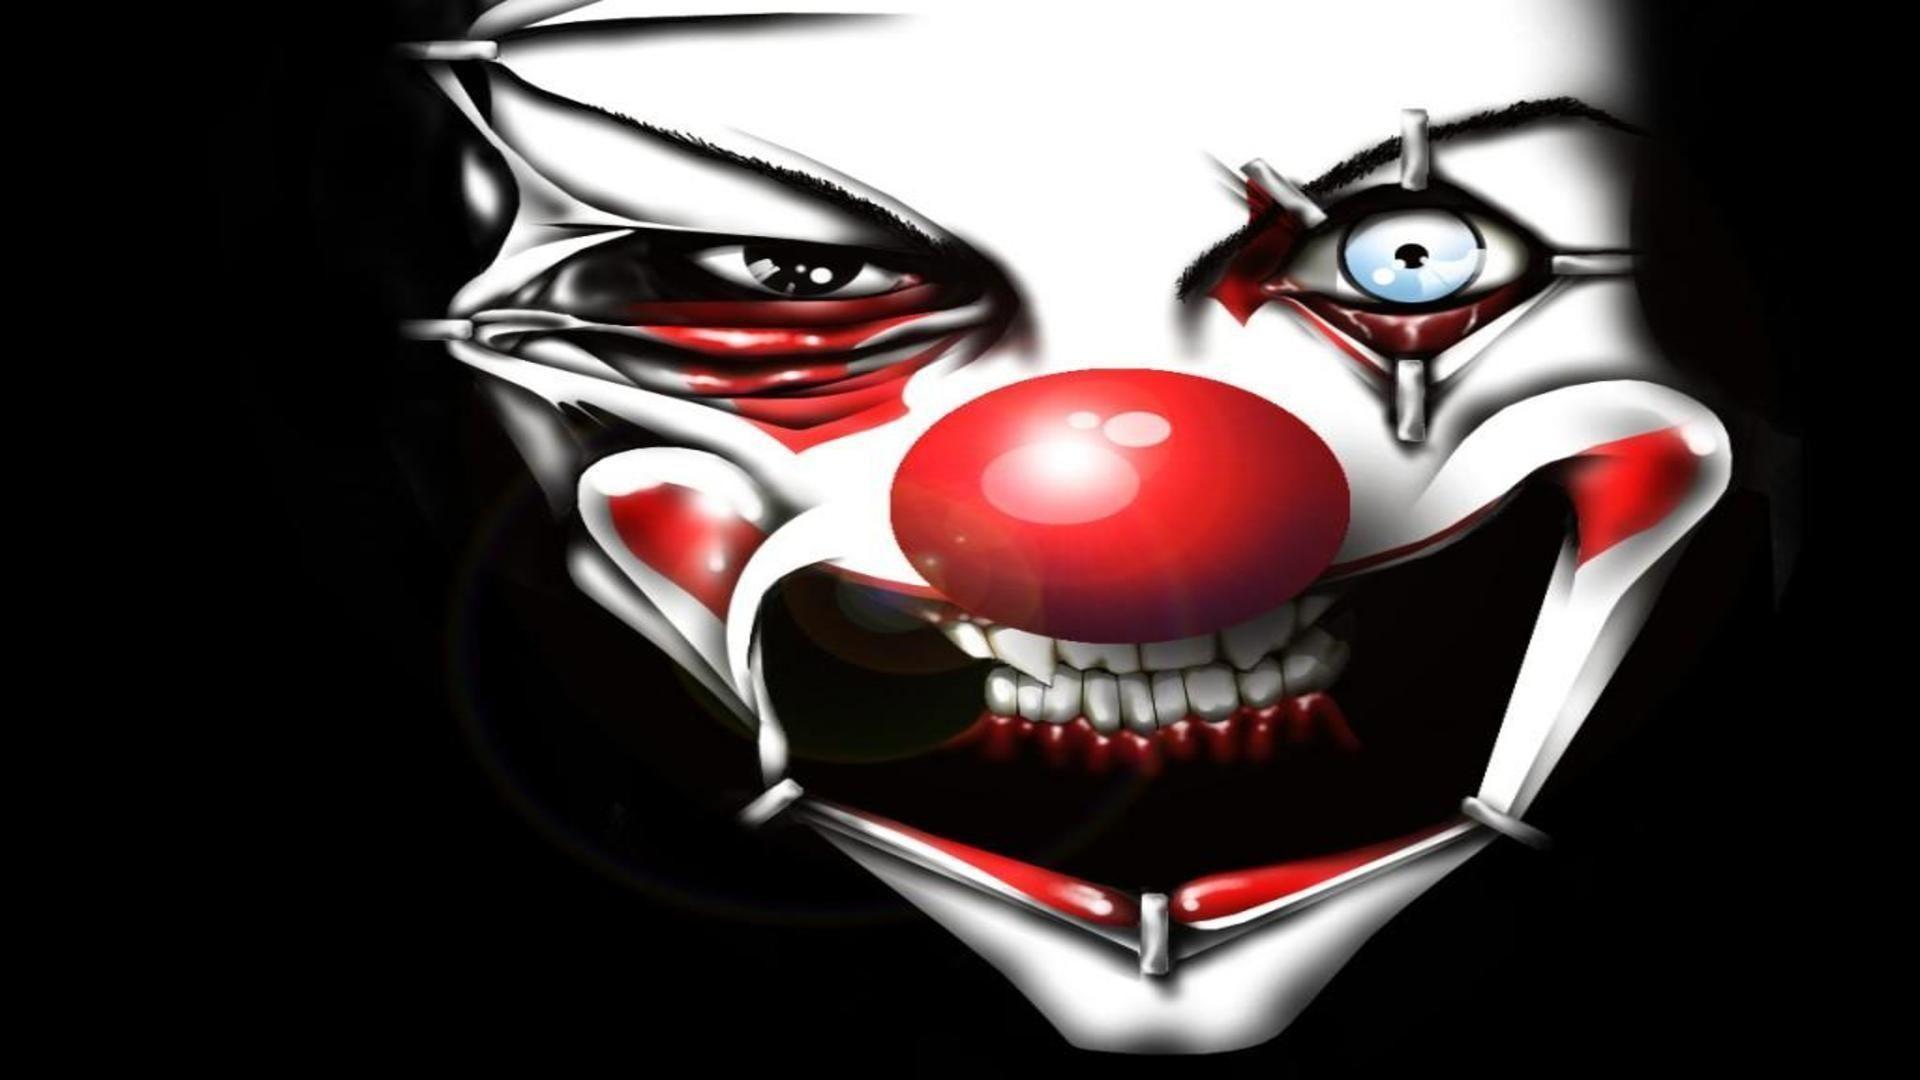 Evil clown face free desktop background – free wallpaper image